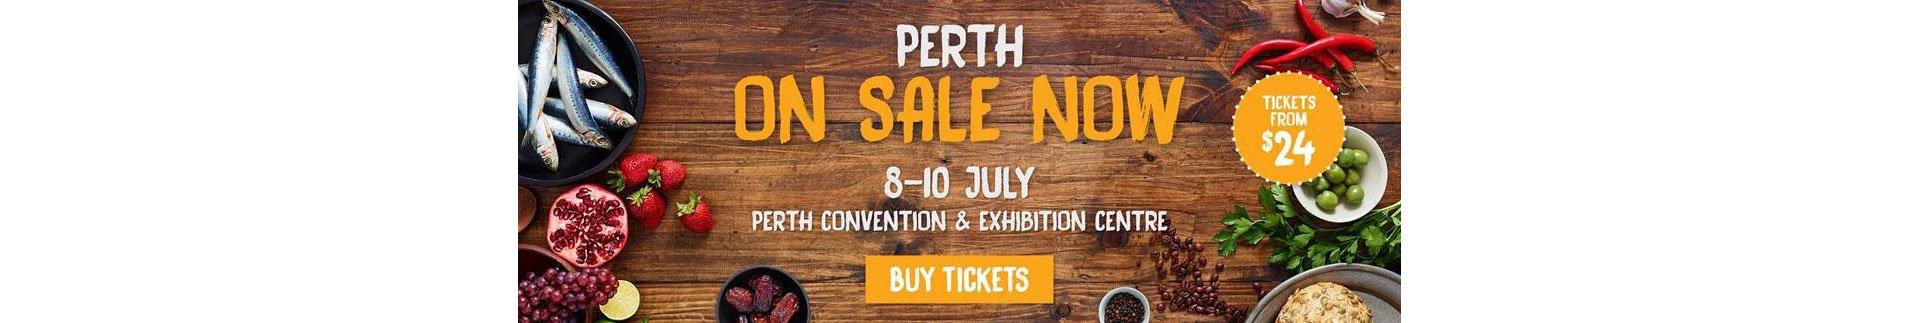 Good Food Wine Show 2016 Perth